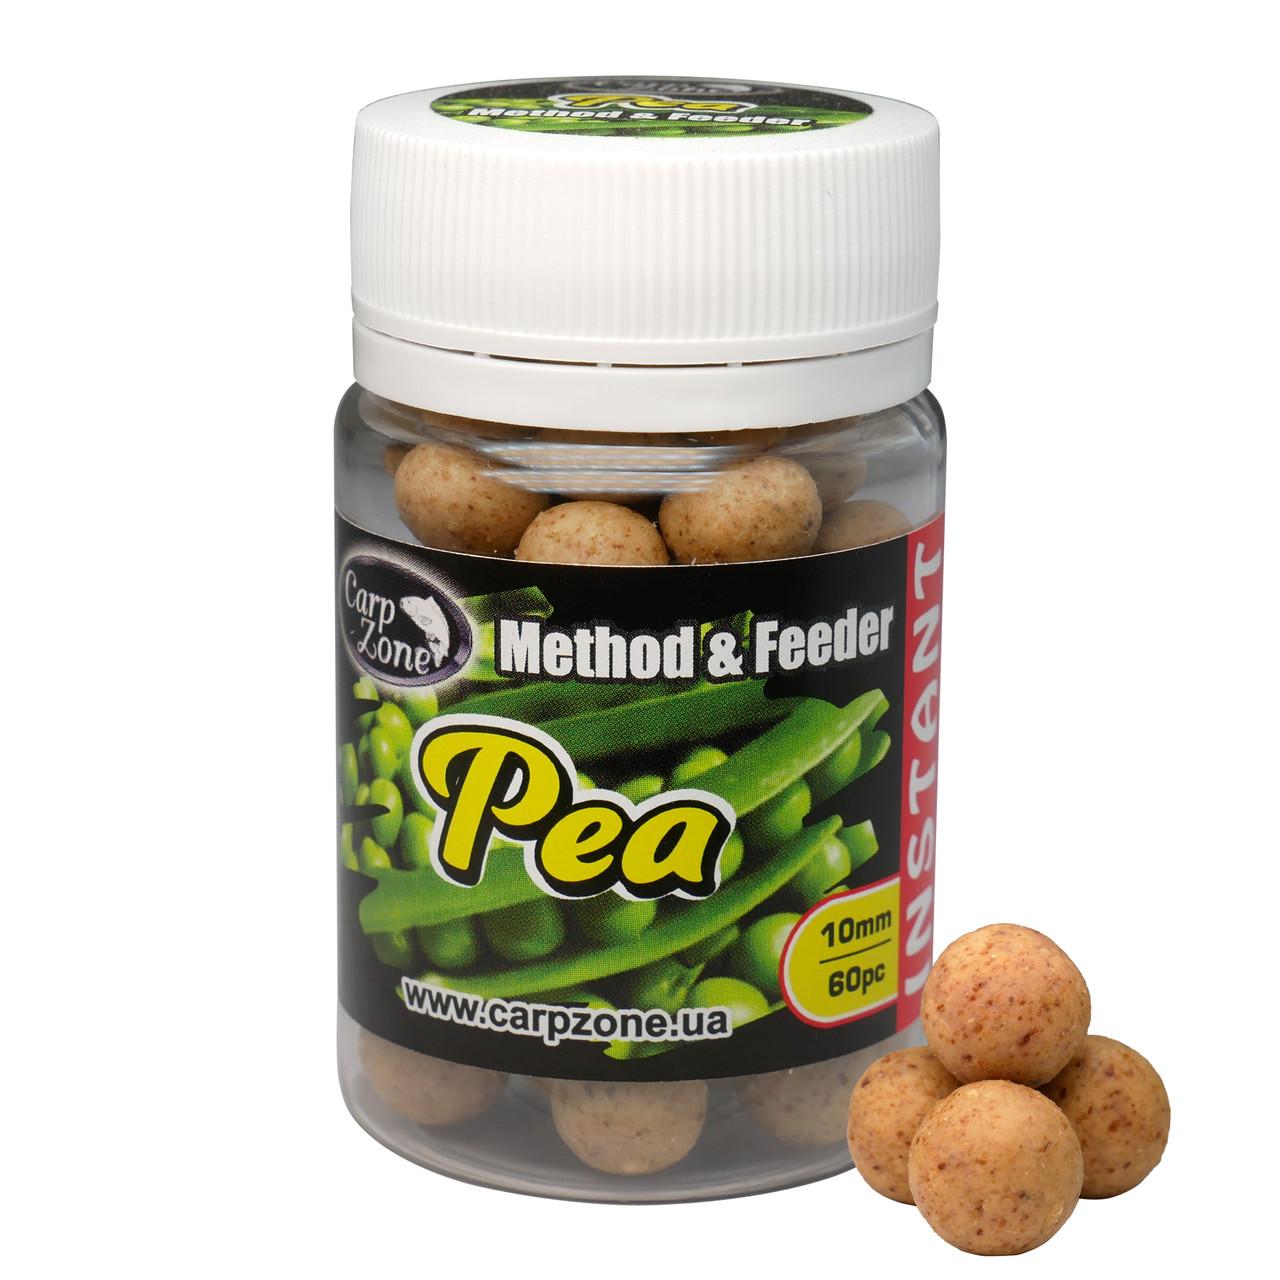 Бойли насадкові варені Boilies Method & Feeder series Instant Pea (Горох) 10mm/60pc